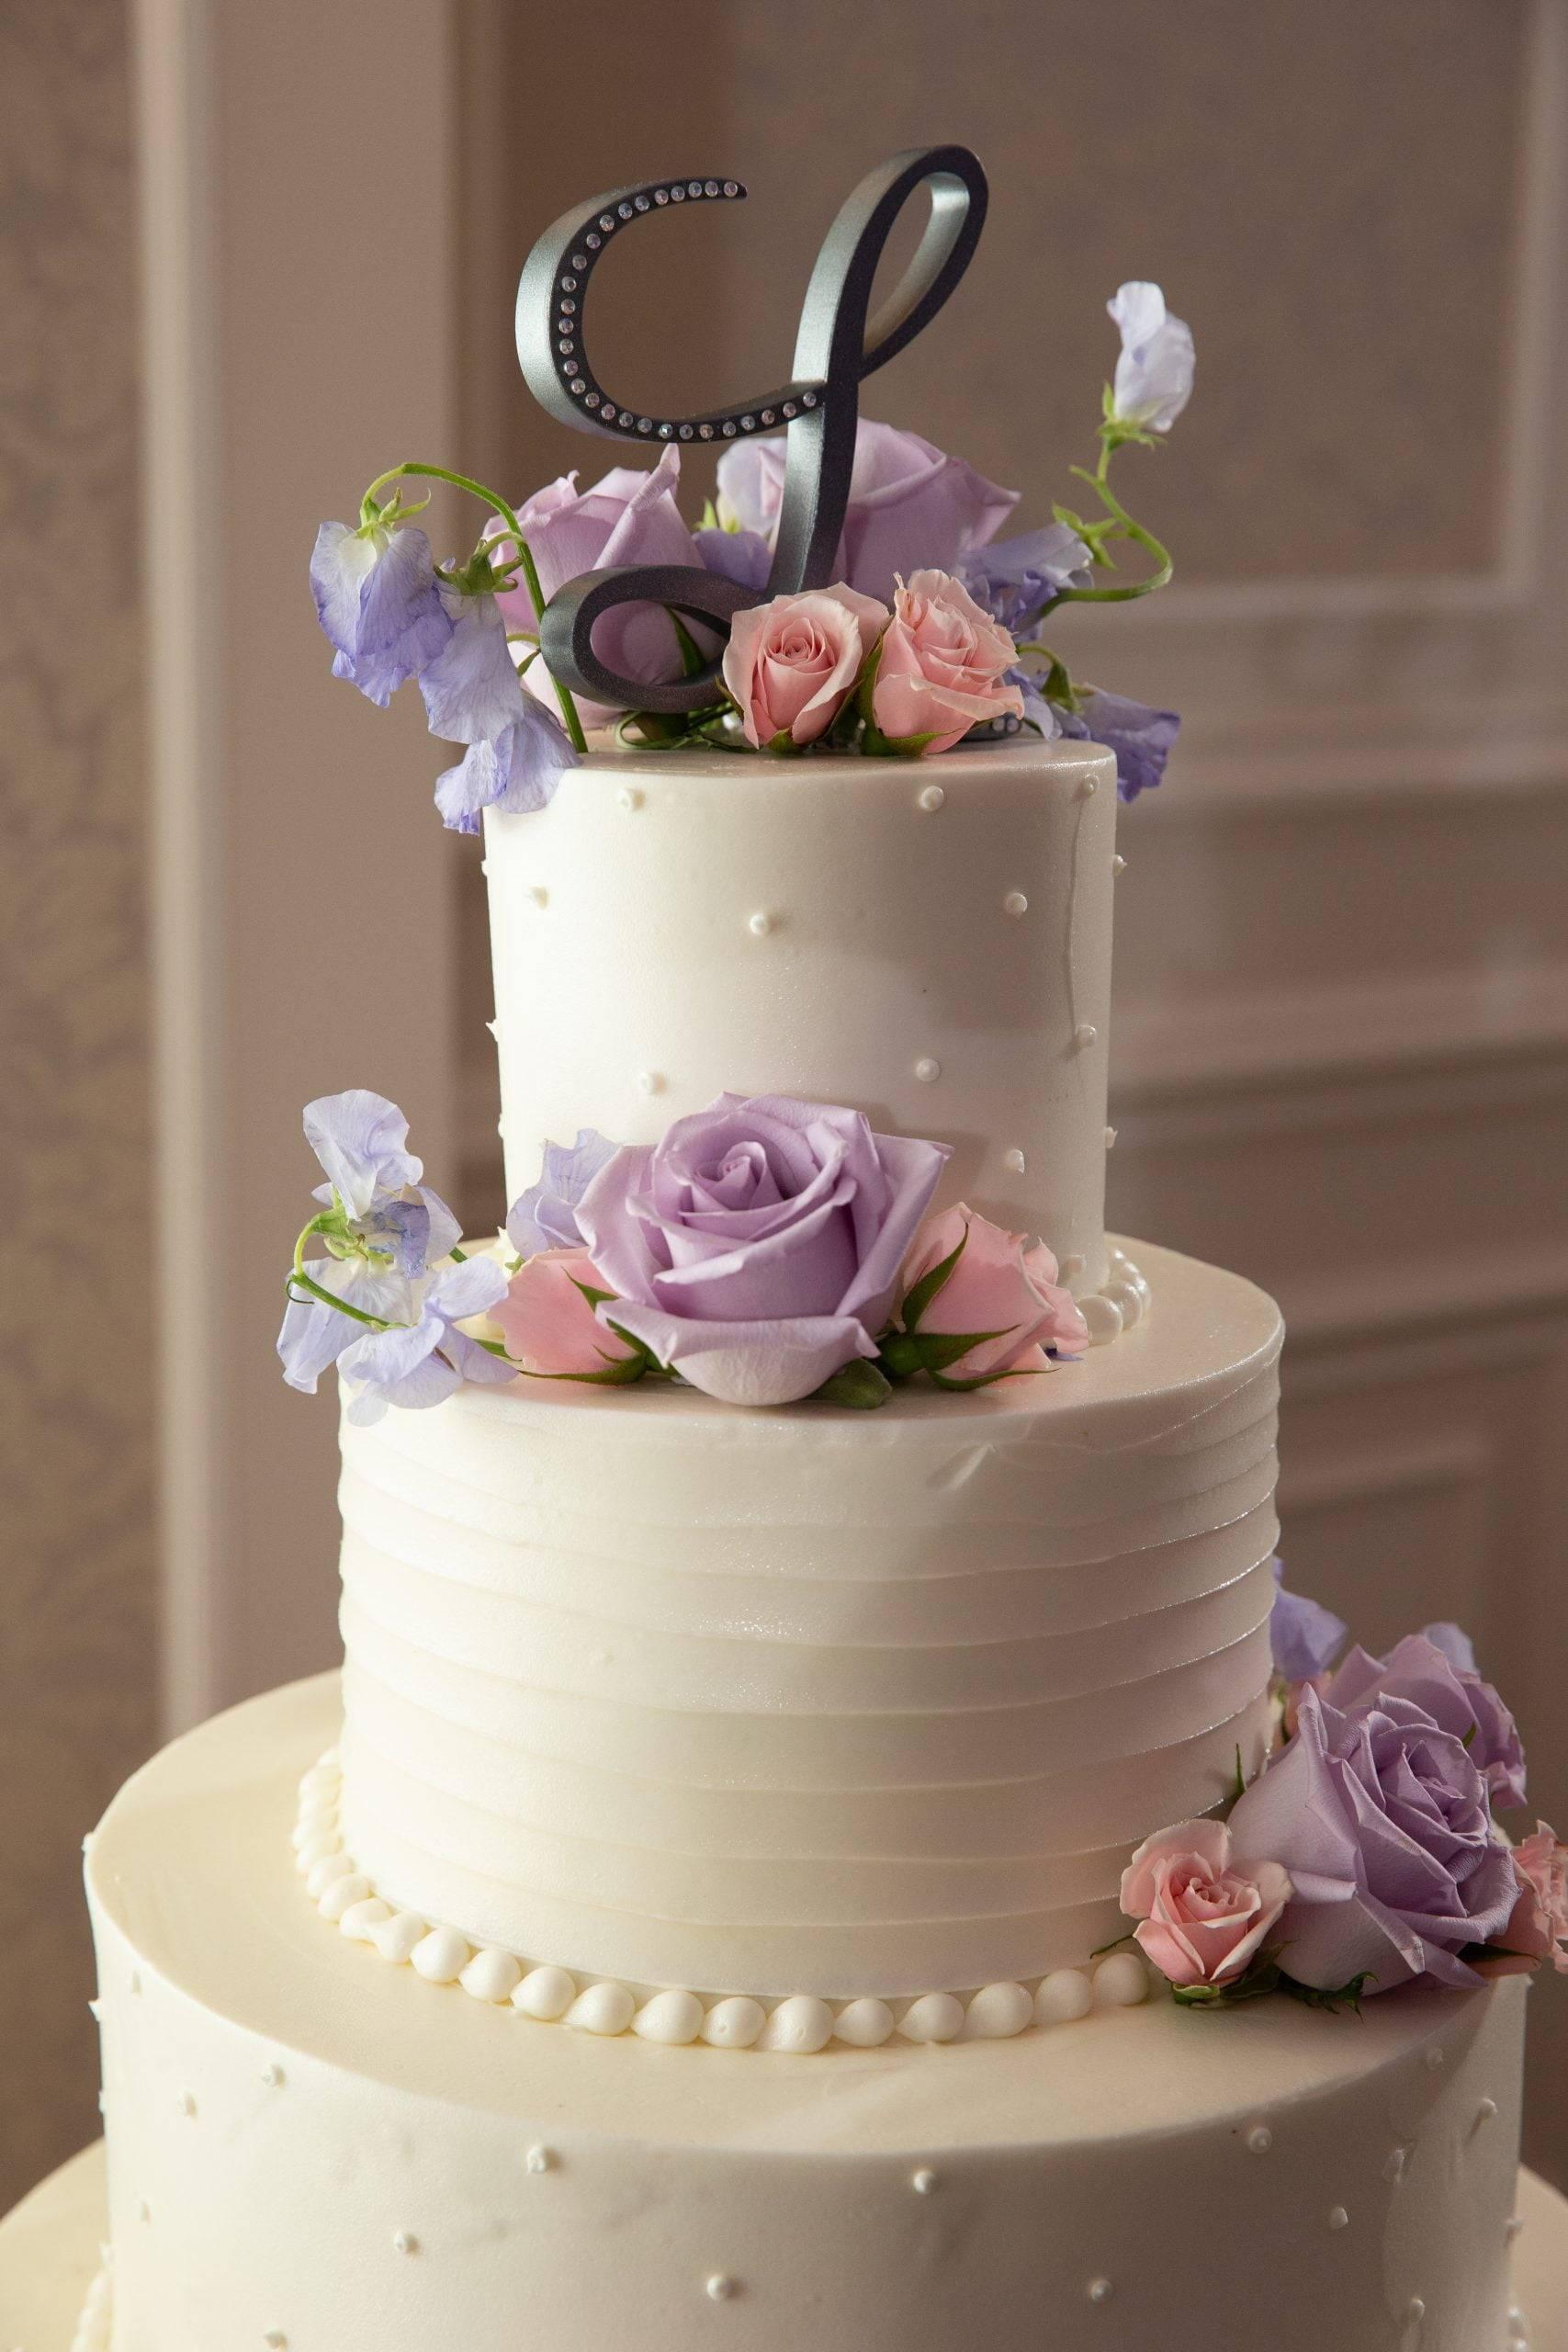 Meadow Wood wedding cake with flowers